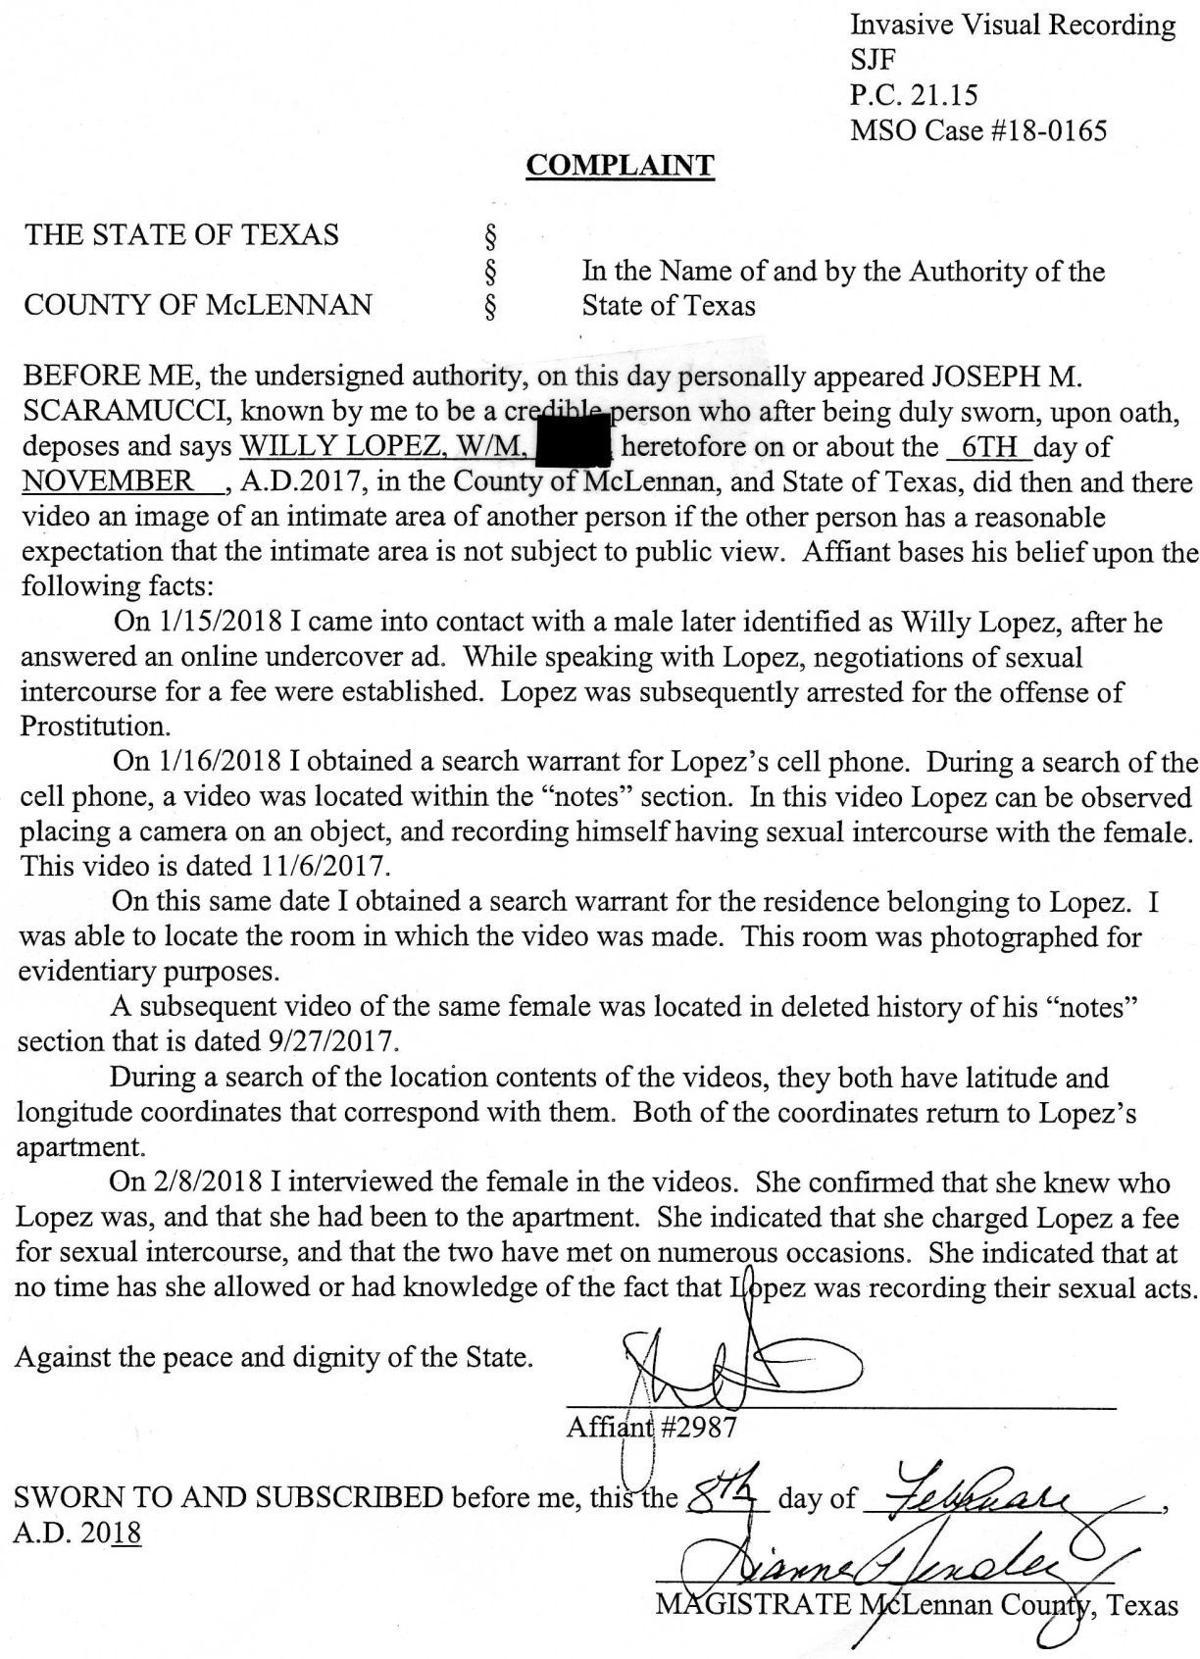 Lopez affidavit